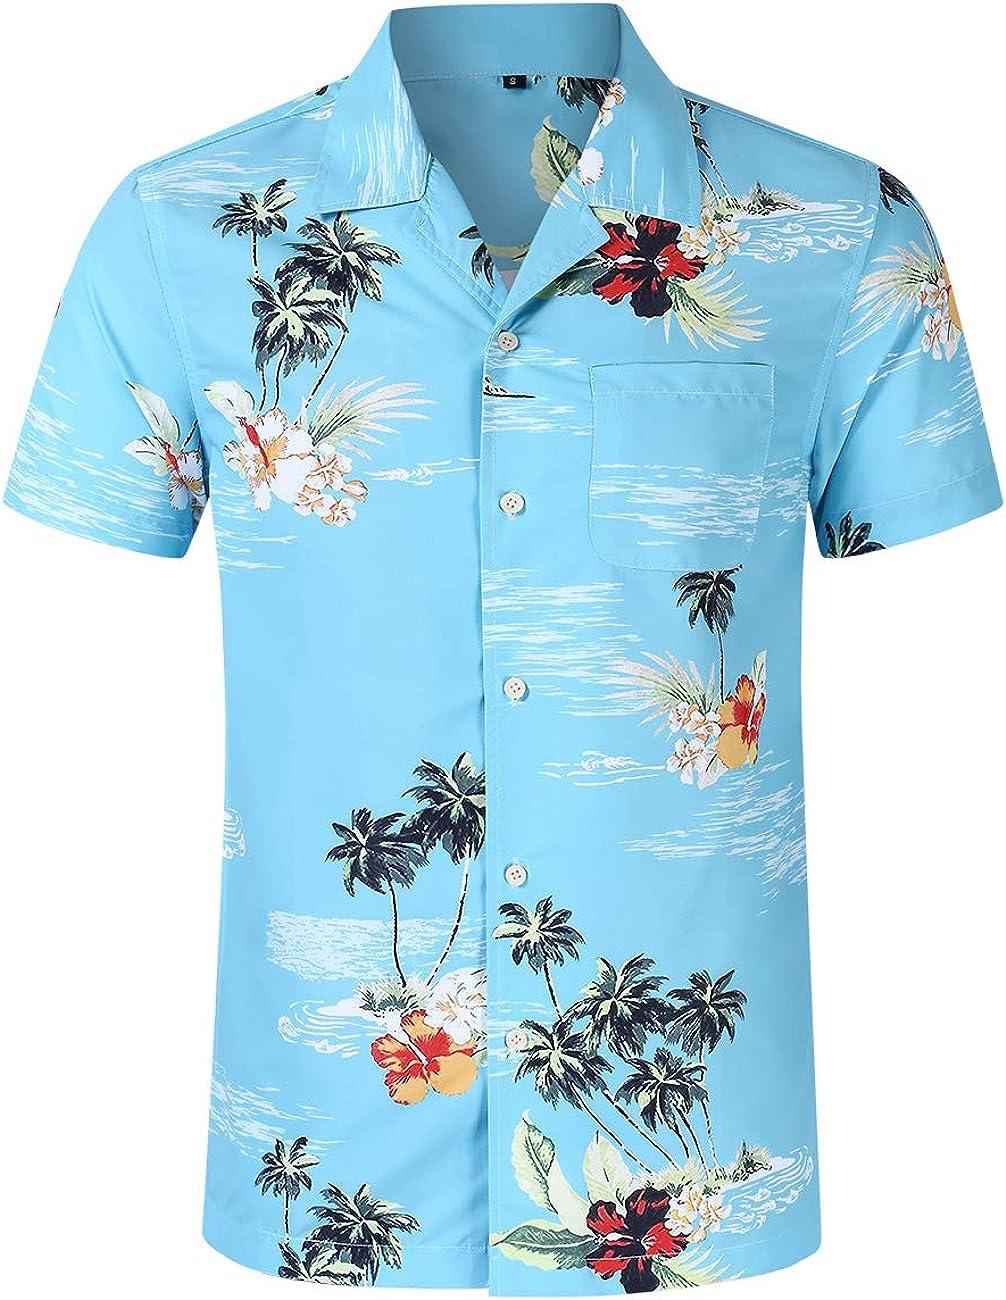 Satankud Men's Tropical Hawaiian Shirt Casual Front-Pocket Short Sleeve Beach Shirts Flower Printed